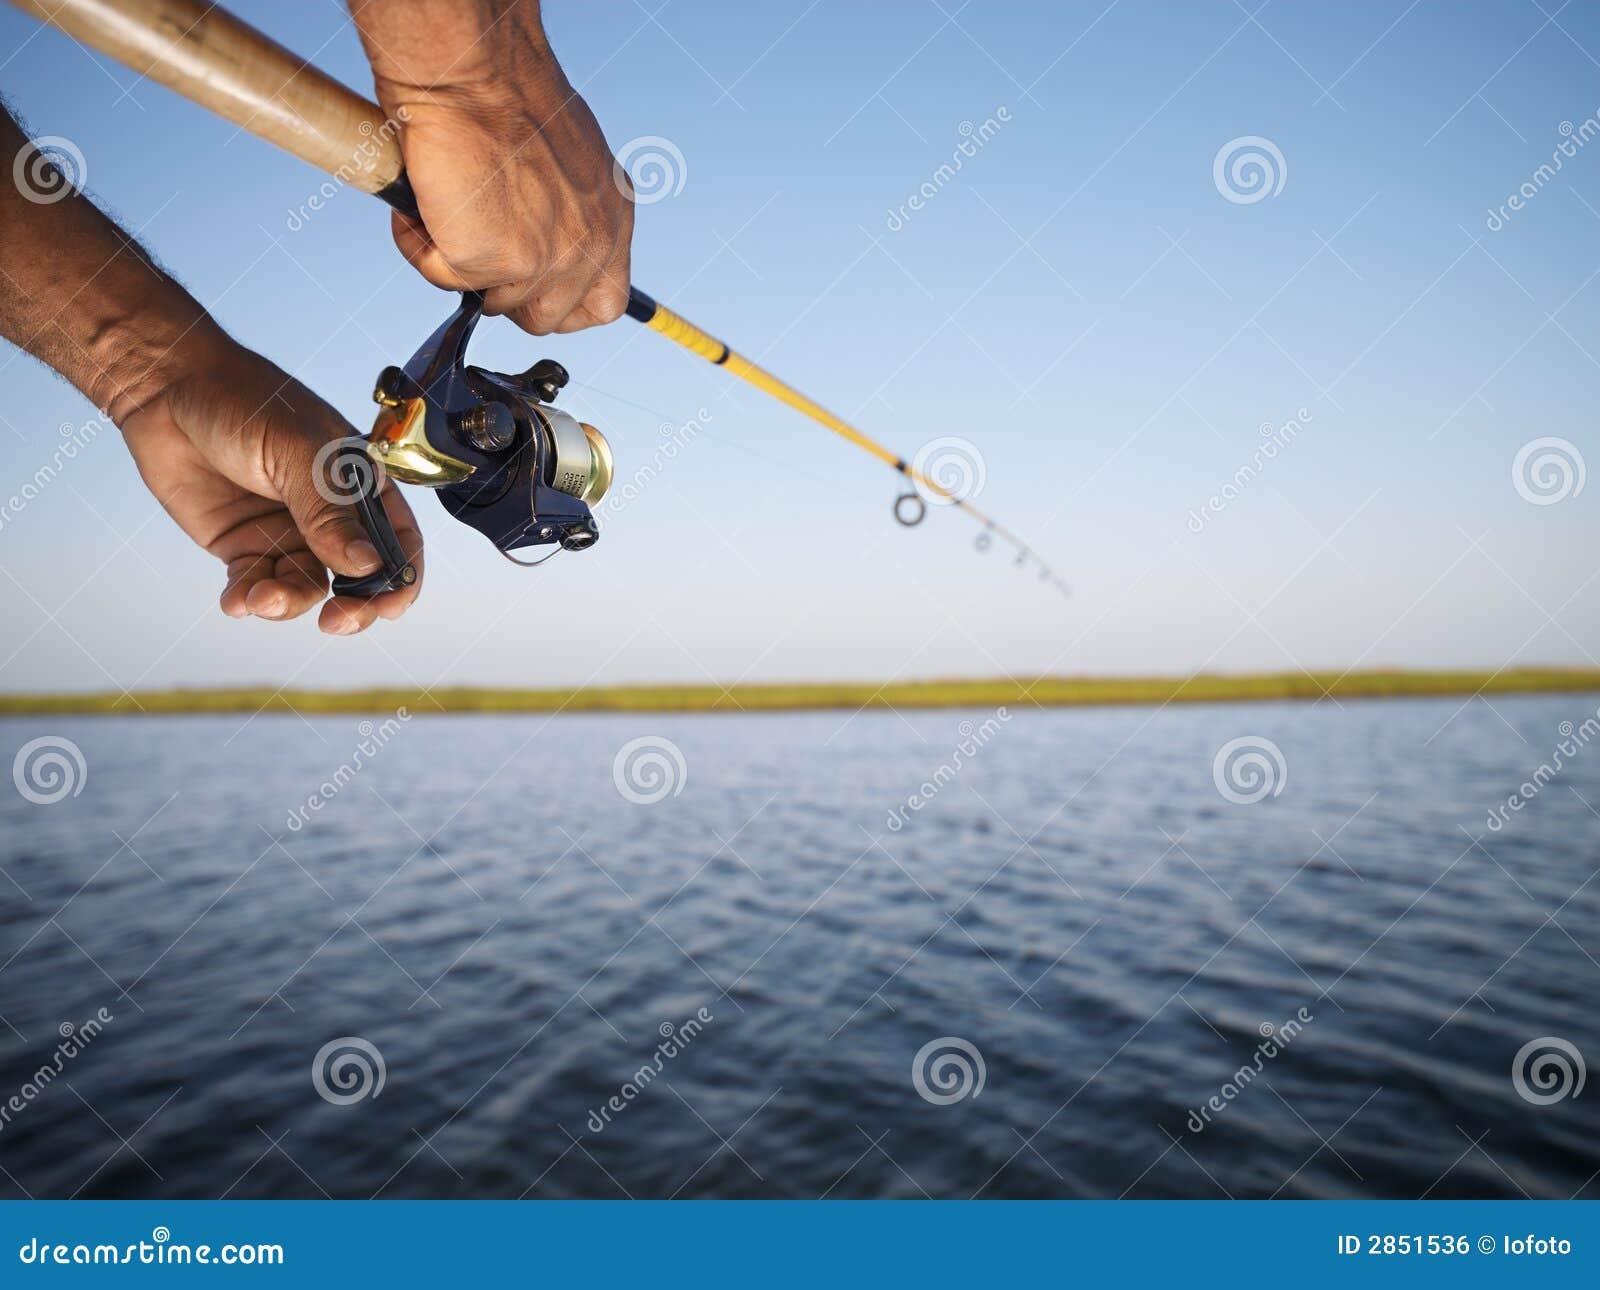 Download 280 Man Holding Fishing Pole Svg Svg Png Eps Dxf File